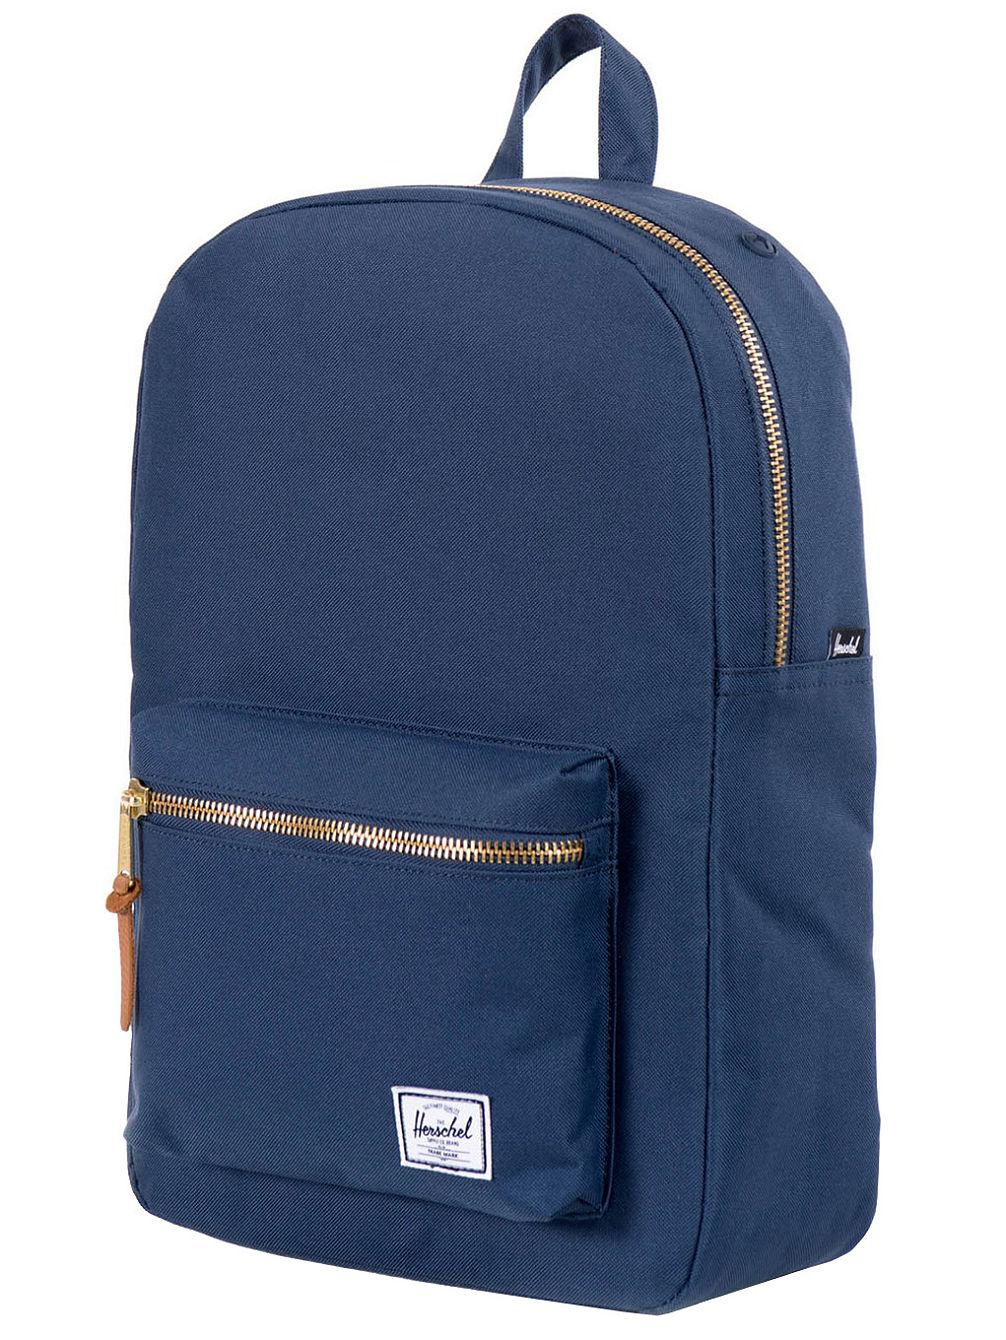 e641a61135c1 Buy Herschel Settlement Mid-Volume Backpack online at blue-tomato.com